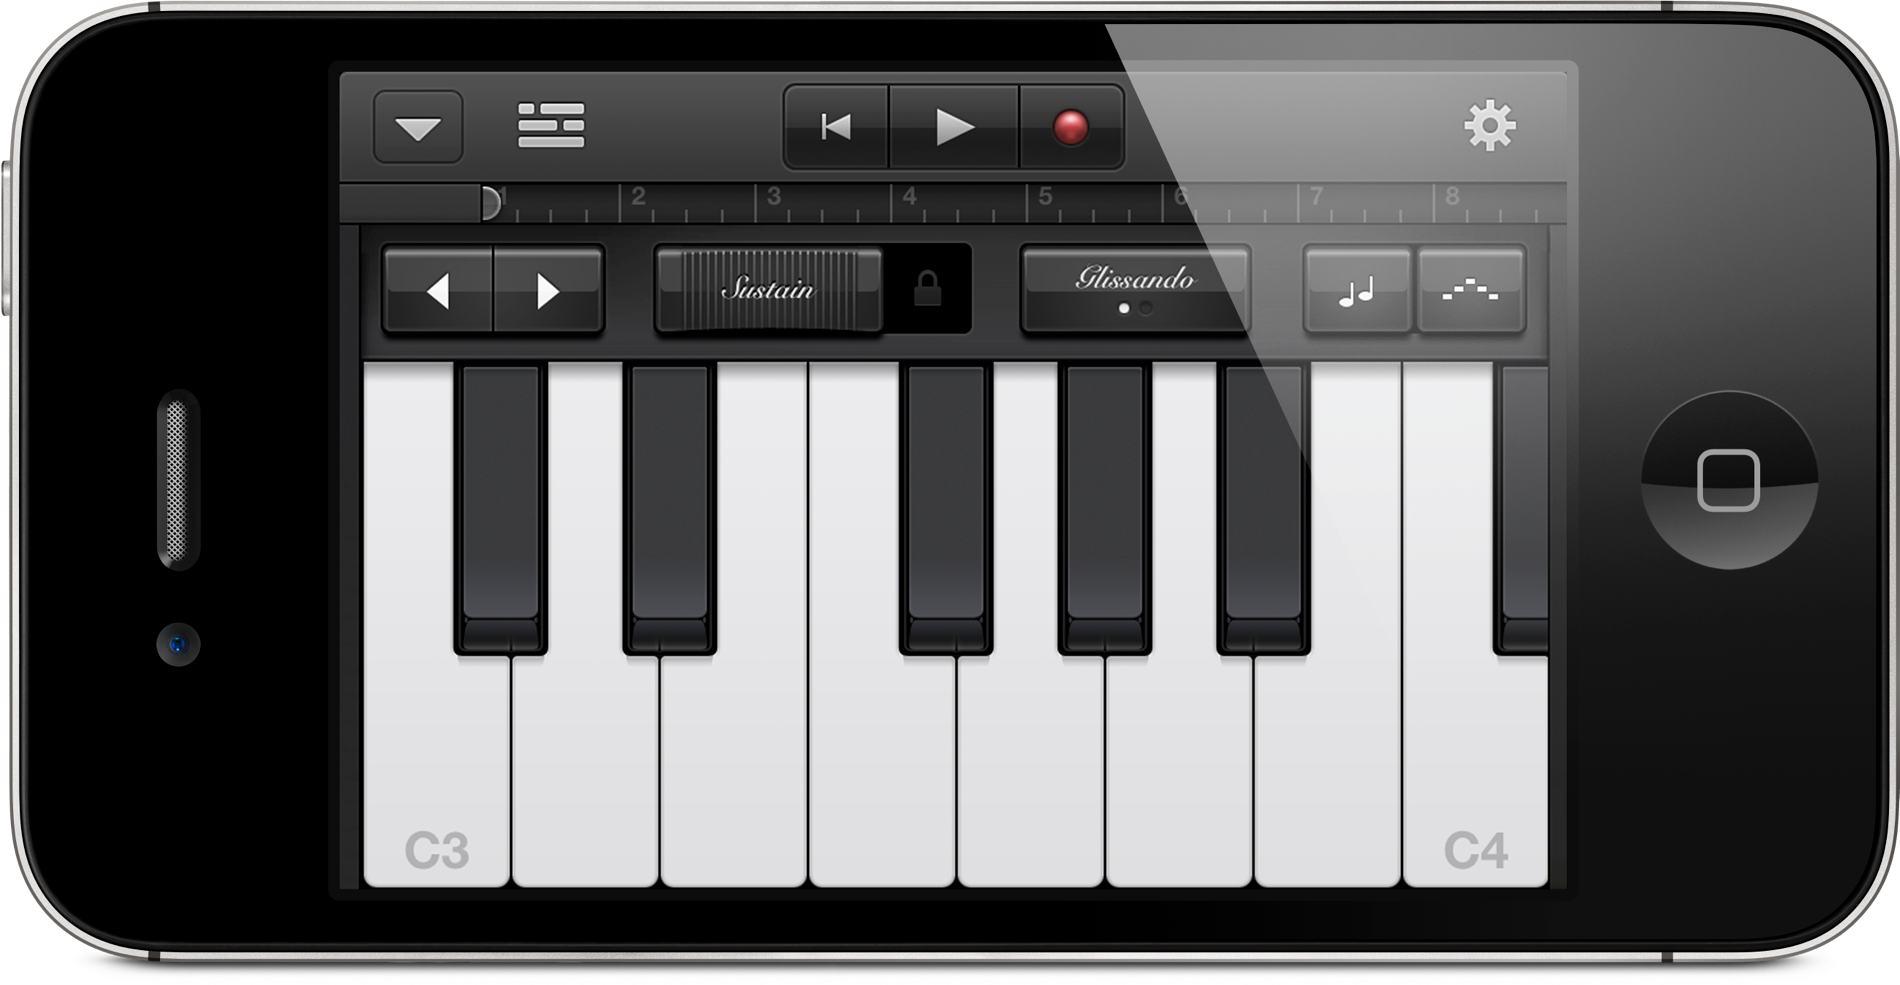 handheld garageband apple 39 s mobile music maker on iphone ipod touch cdm createdigitalmusic. Black Bedroom Furniture Sets. Home Design Ideas